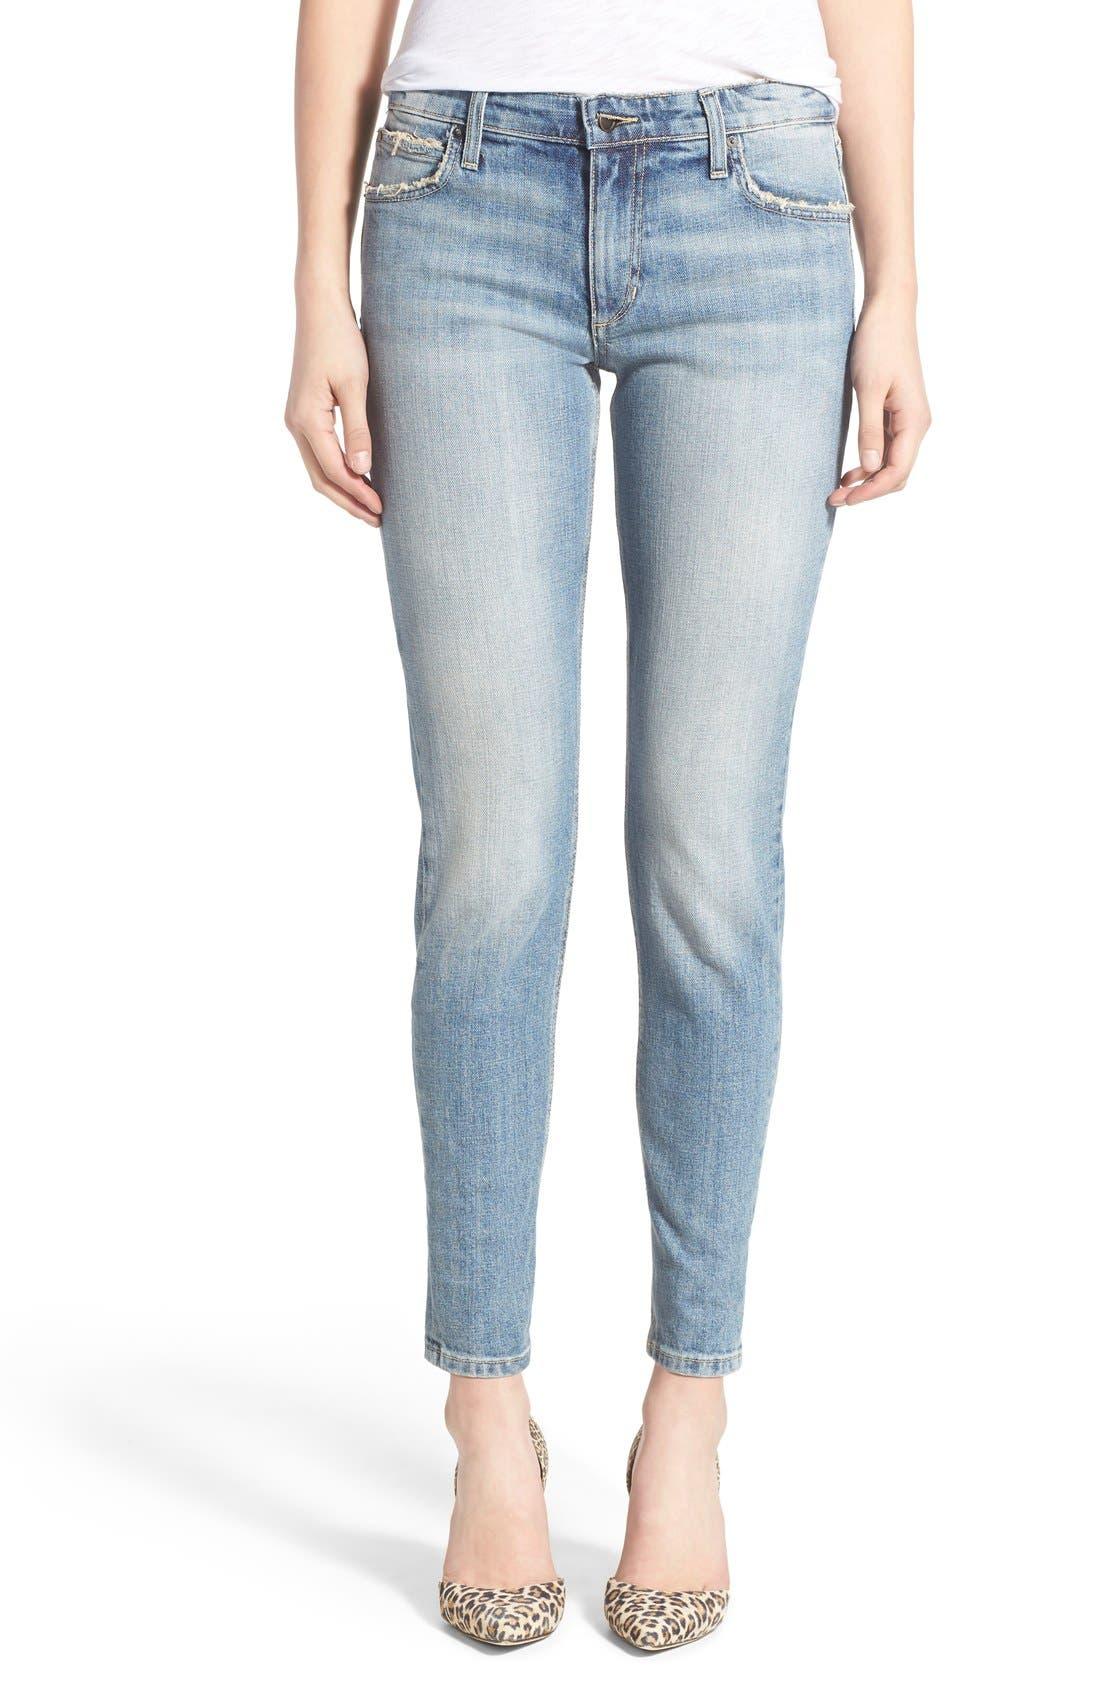 Alternate Image 1 Selected - Joe's 'Collector's - Billie' Ankle Slim Boyfriend Jeans (Rina)